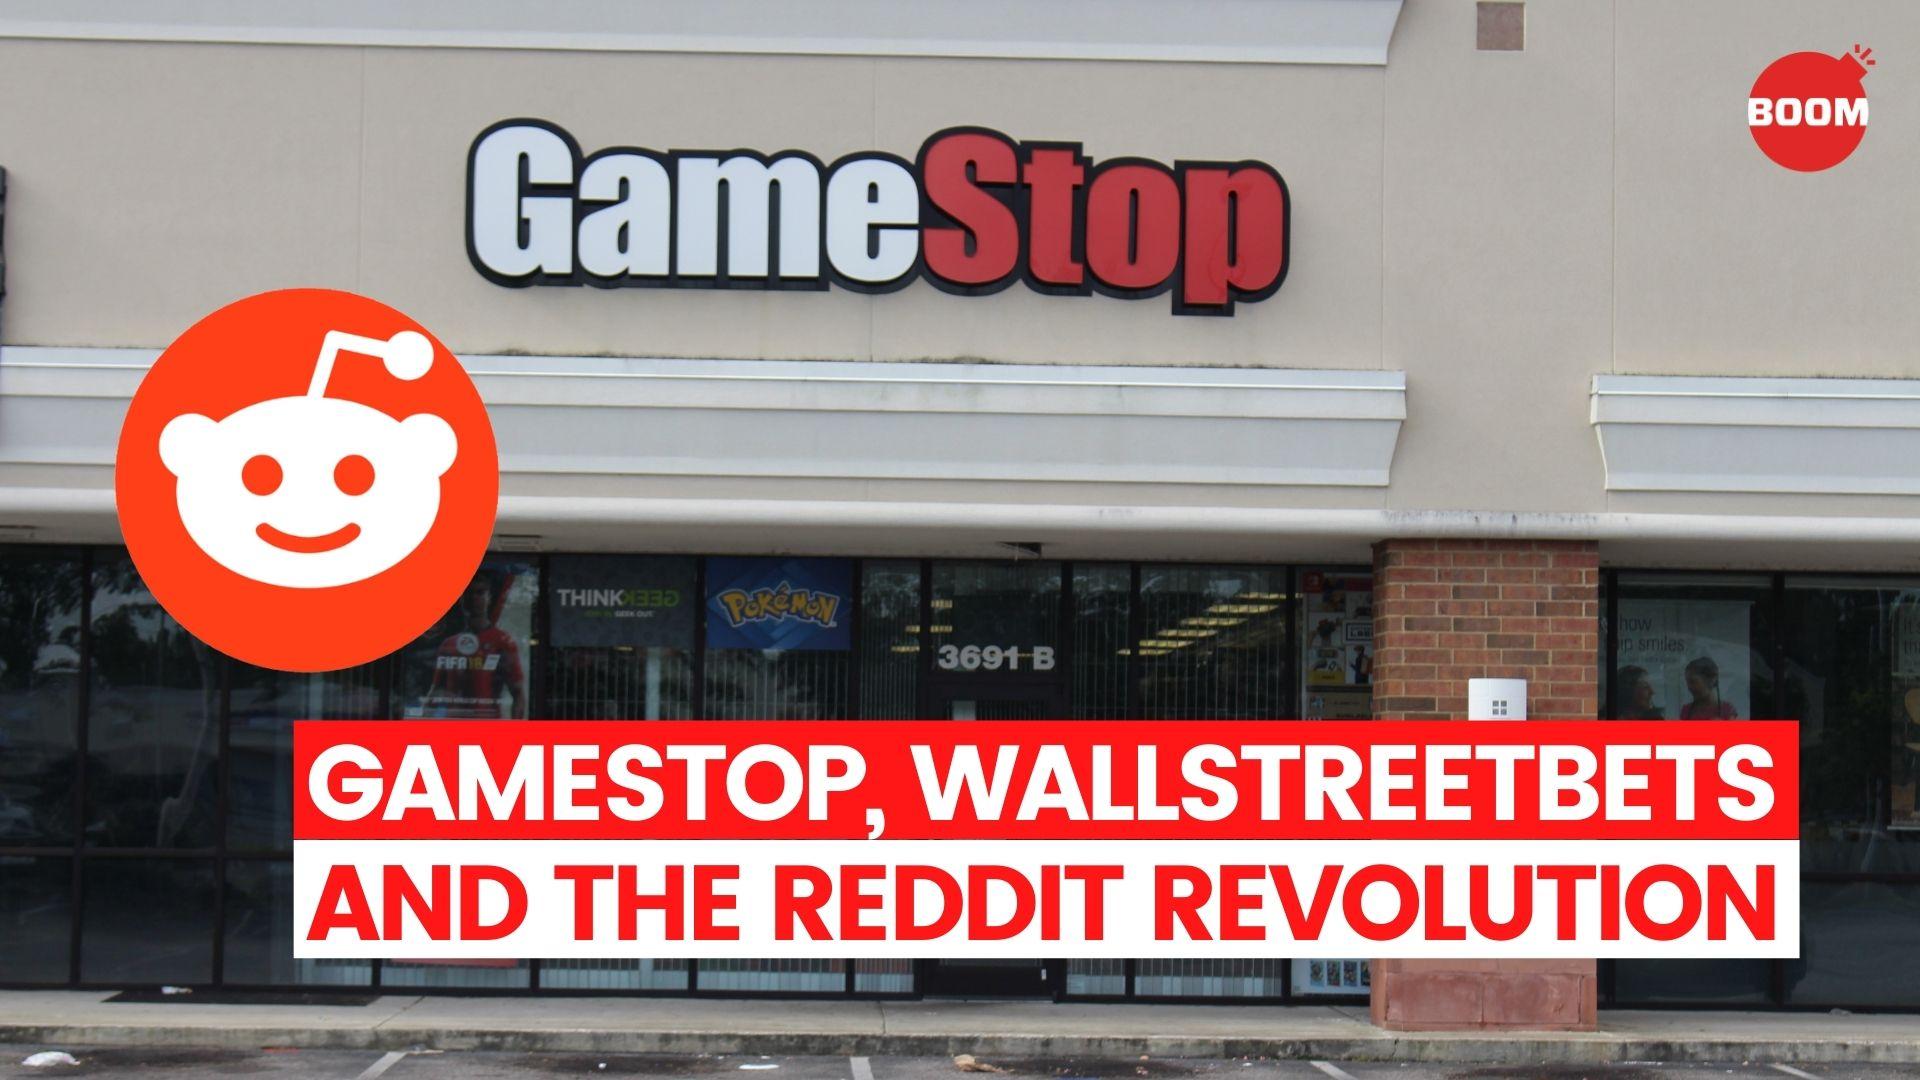 GameStop, WallStreetBets And The Reddit Revolution | BOOM